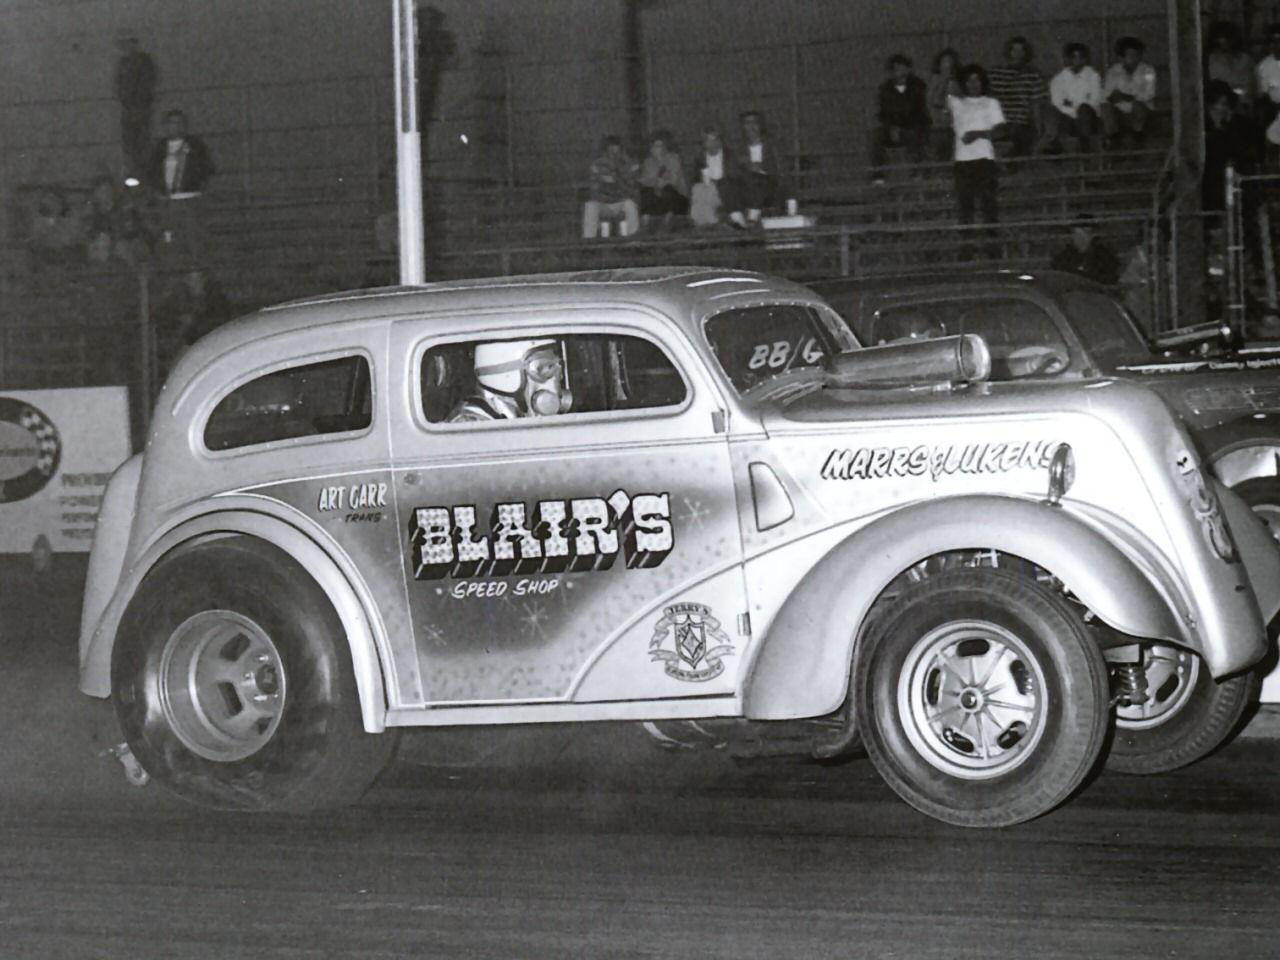 Cars 1935 Ford Chopped Tudor Blair S Speed Shop Drag Strip Hot Rod